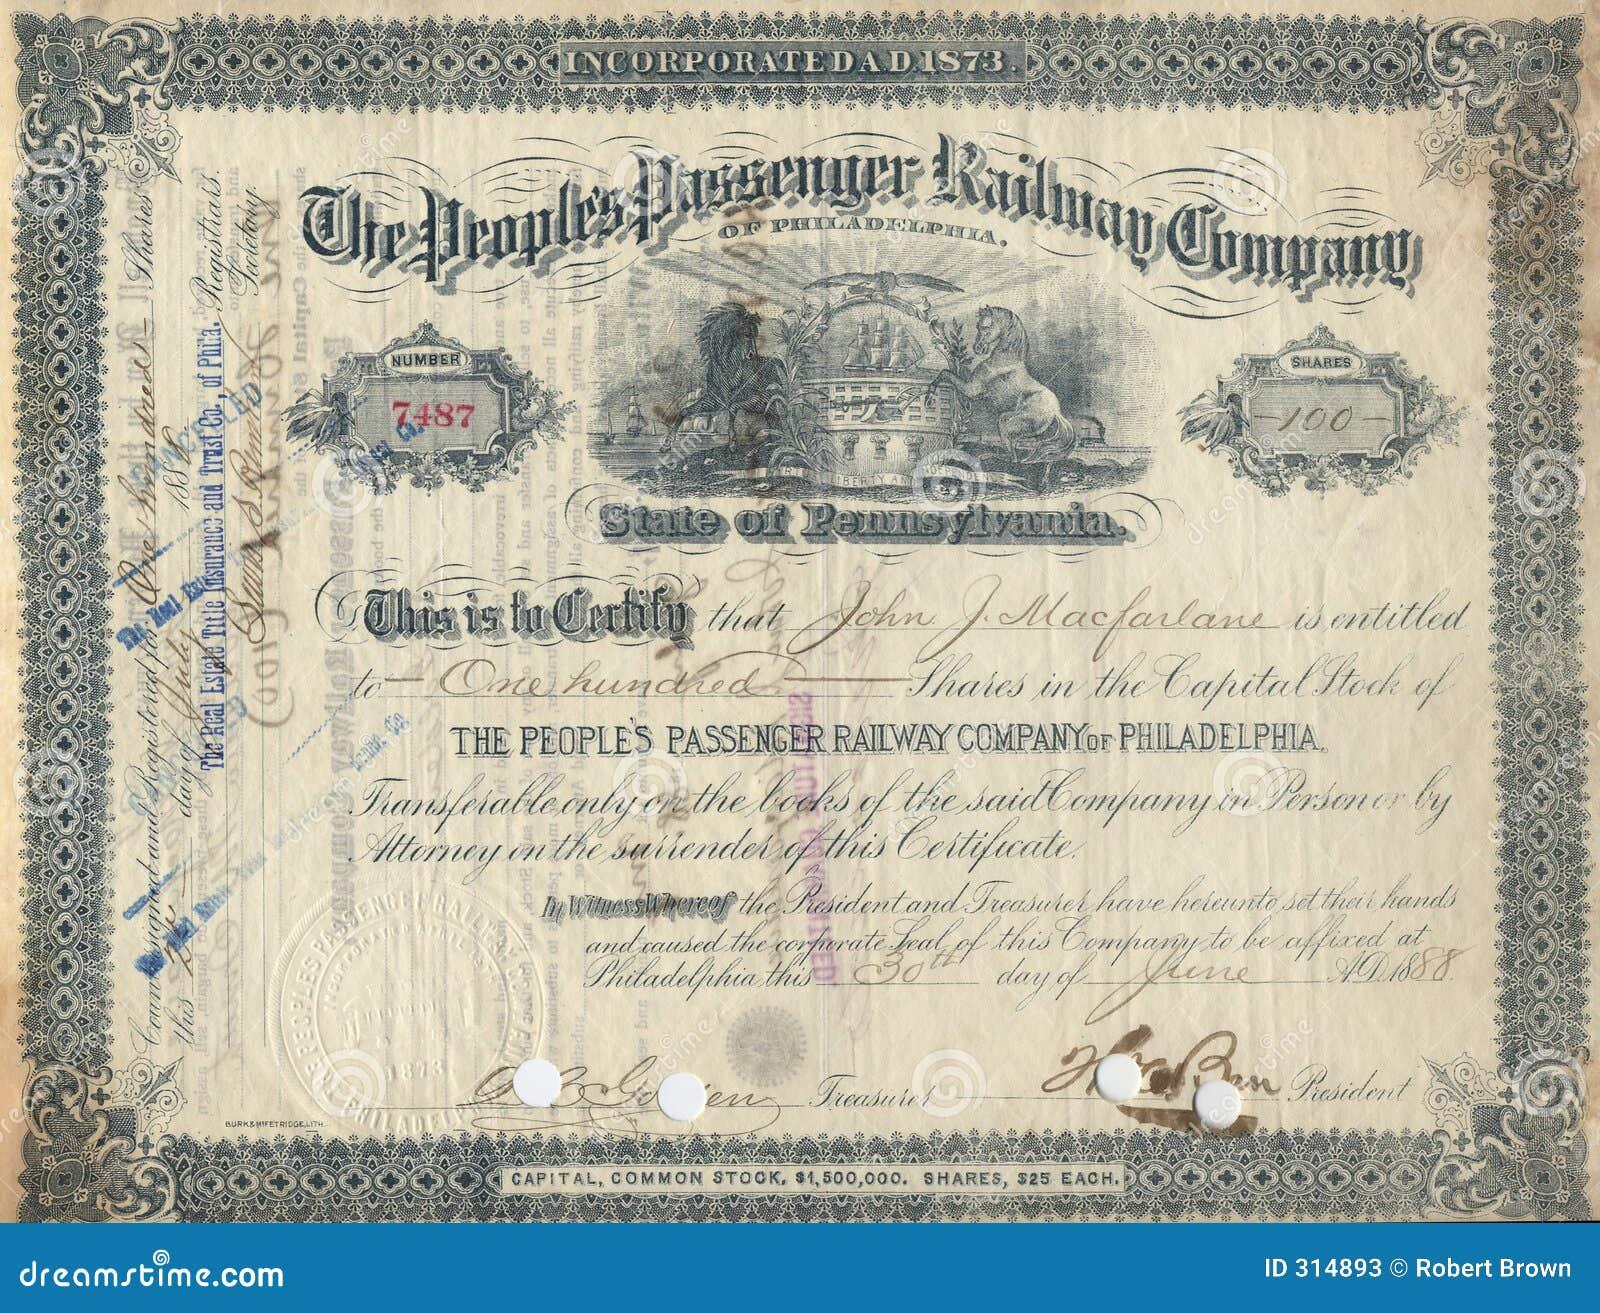 Jardine Matheson Group Stock: Old Stock Certificate 3 Stock Photos